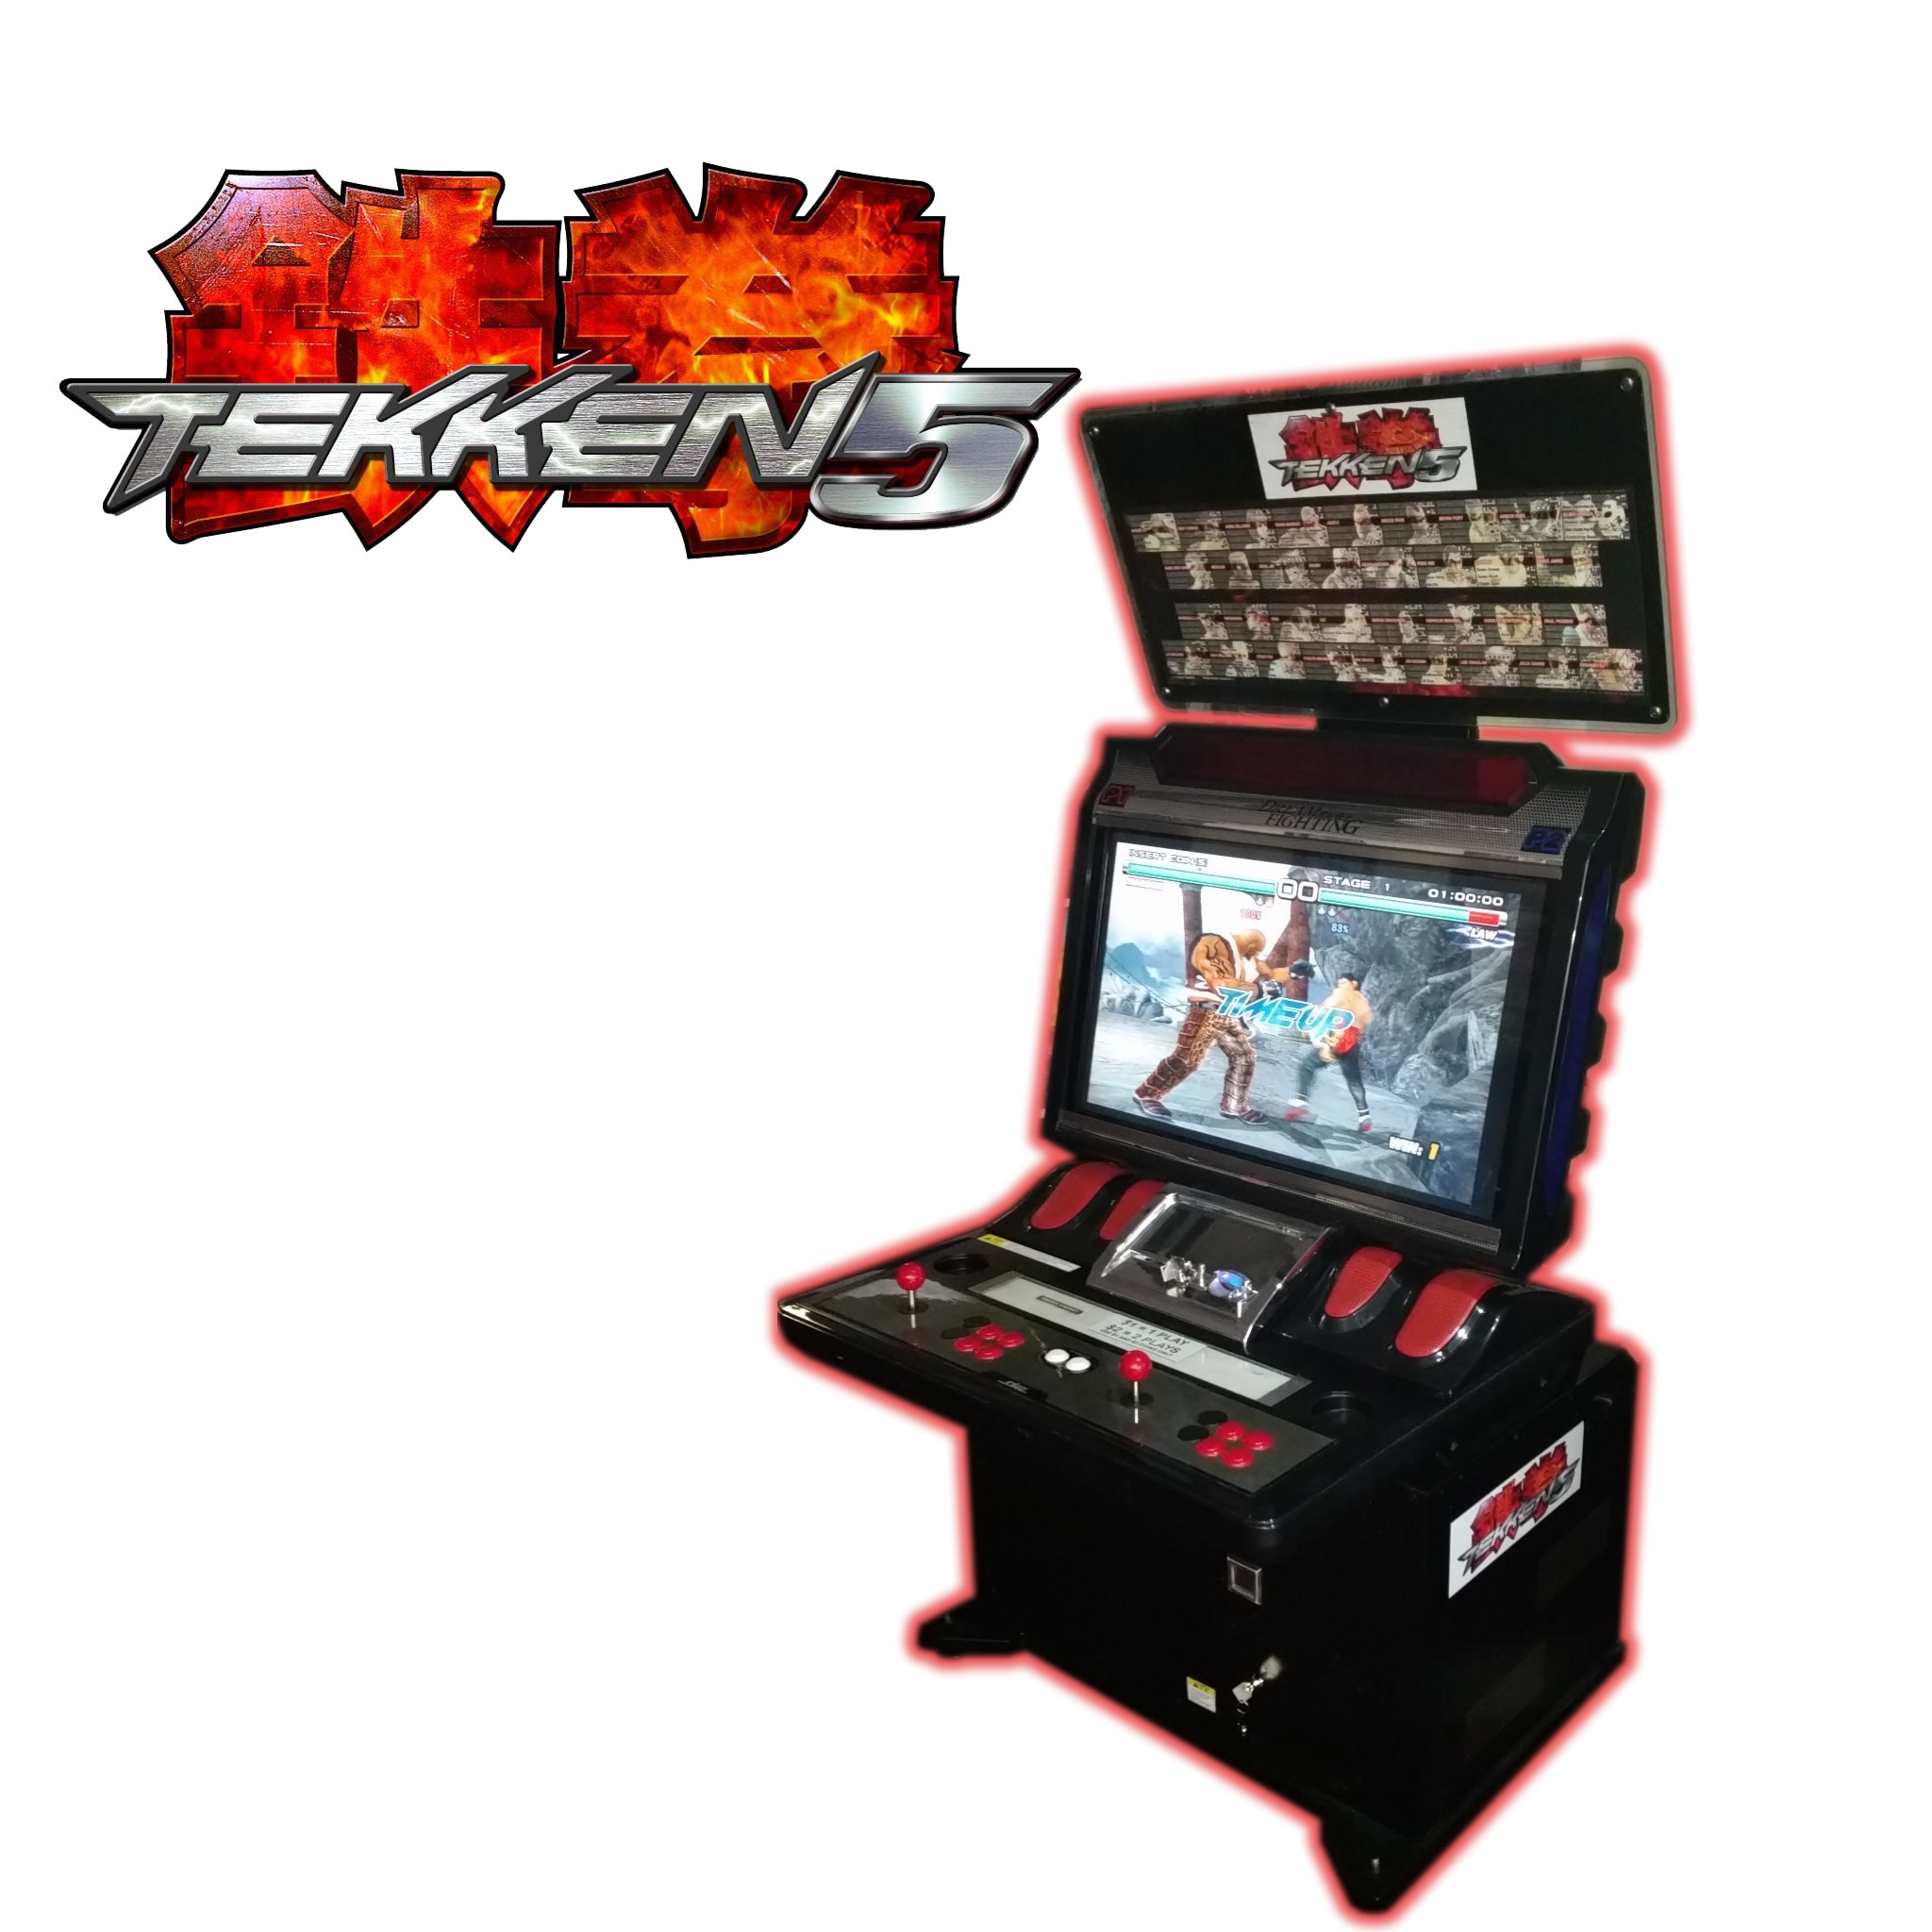 Tekken 5 - Arcade Classics Australia - Arcade Machines and ...